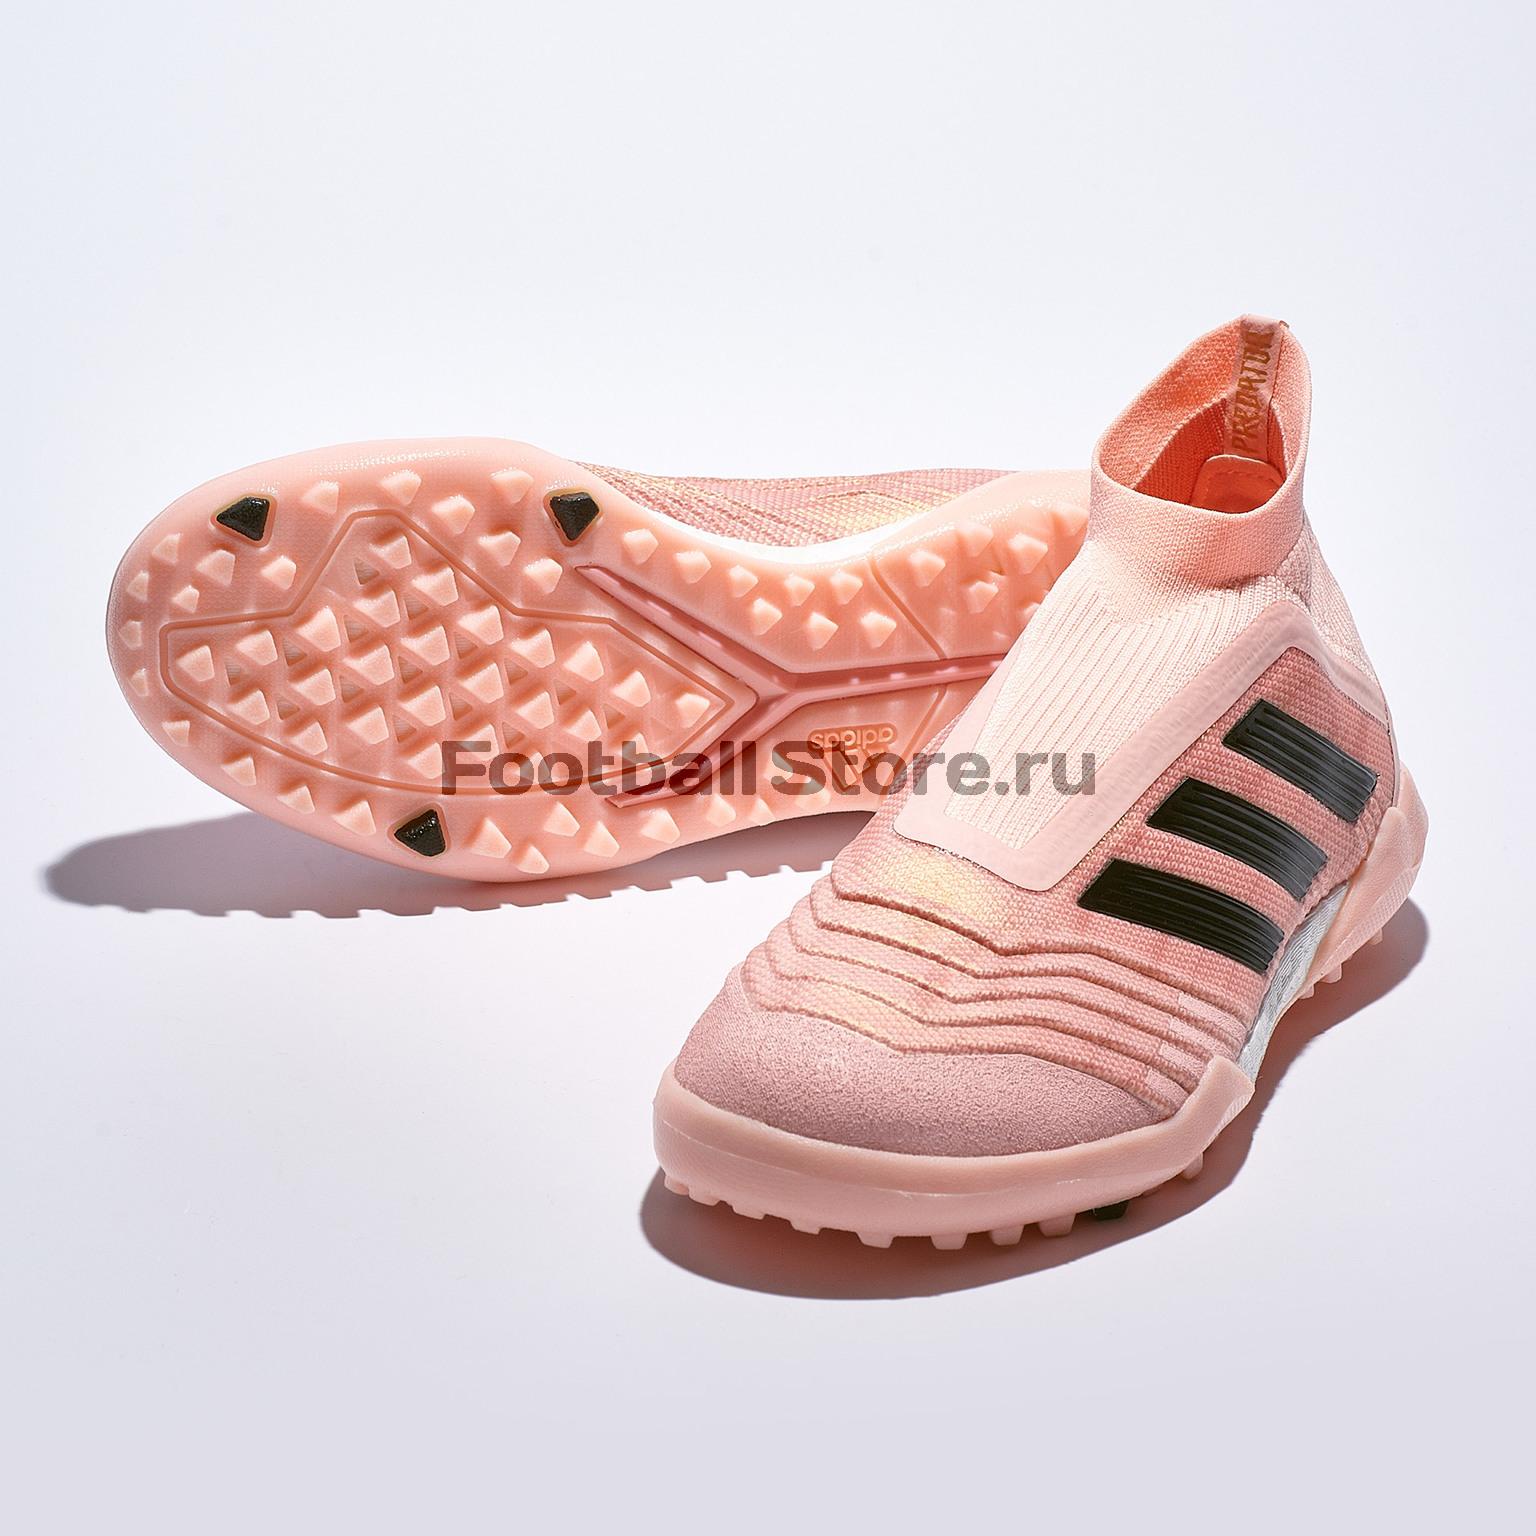 Шиповки Adidas Predator Tango 18+ TF DB2059